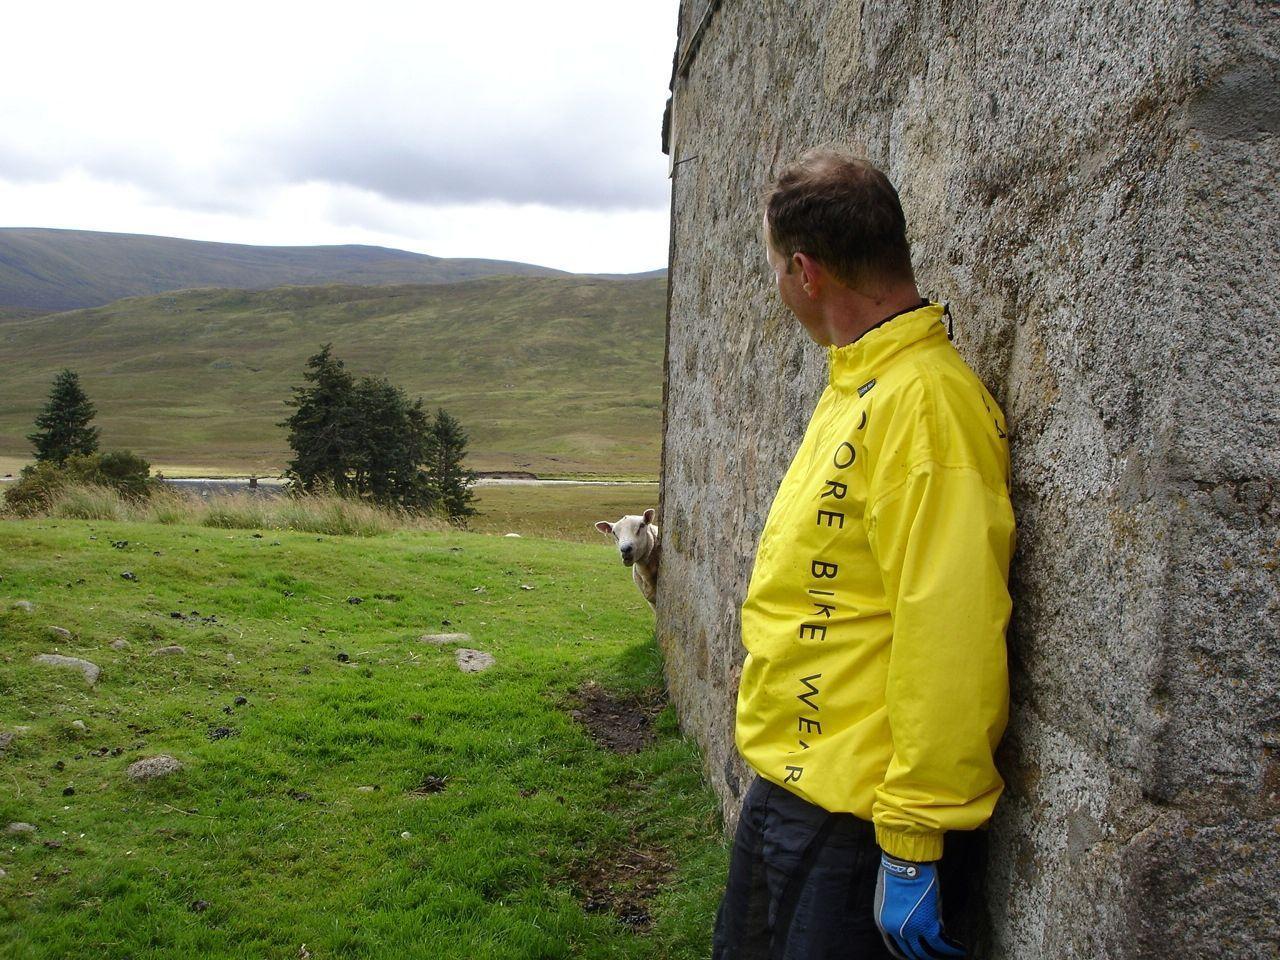 historic-sites-mountain-biking-scottish-highlands.jpg - Scotland - Celtic Crossing - Guided Mountain Bike Holiday - Mountain Biking